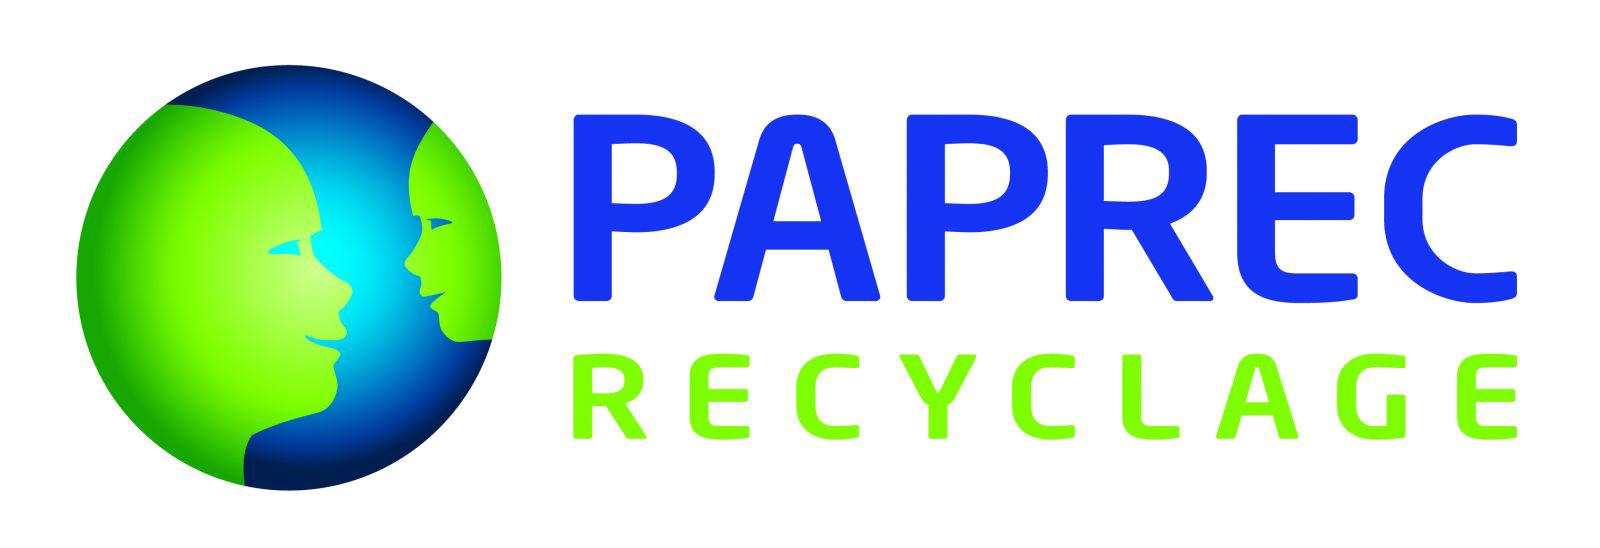 Paprec-recyclage